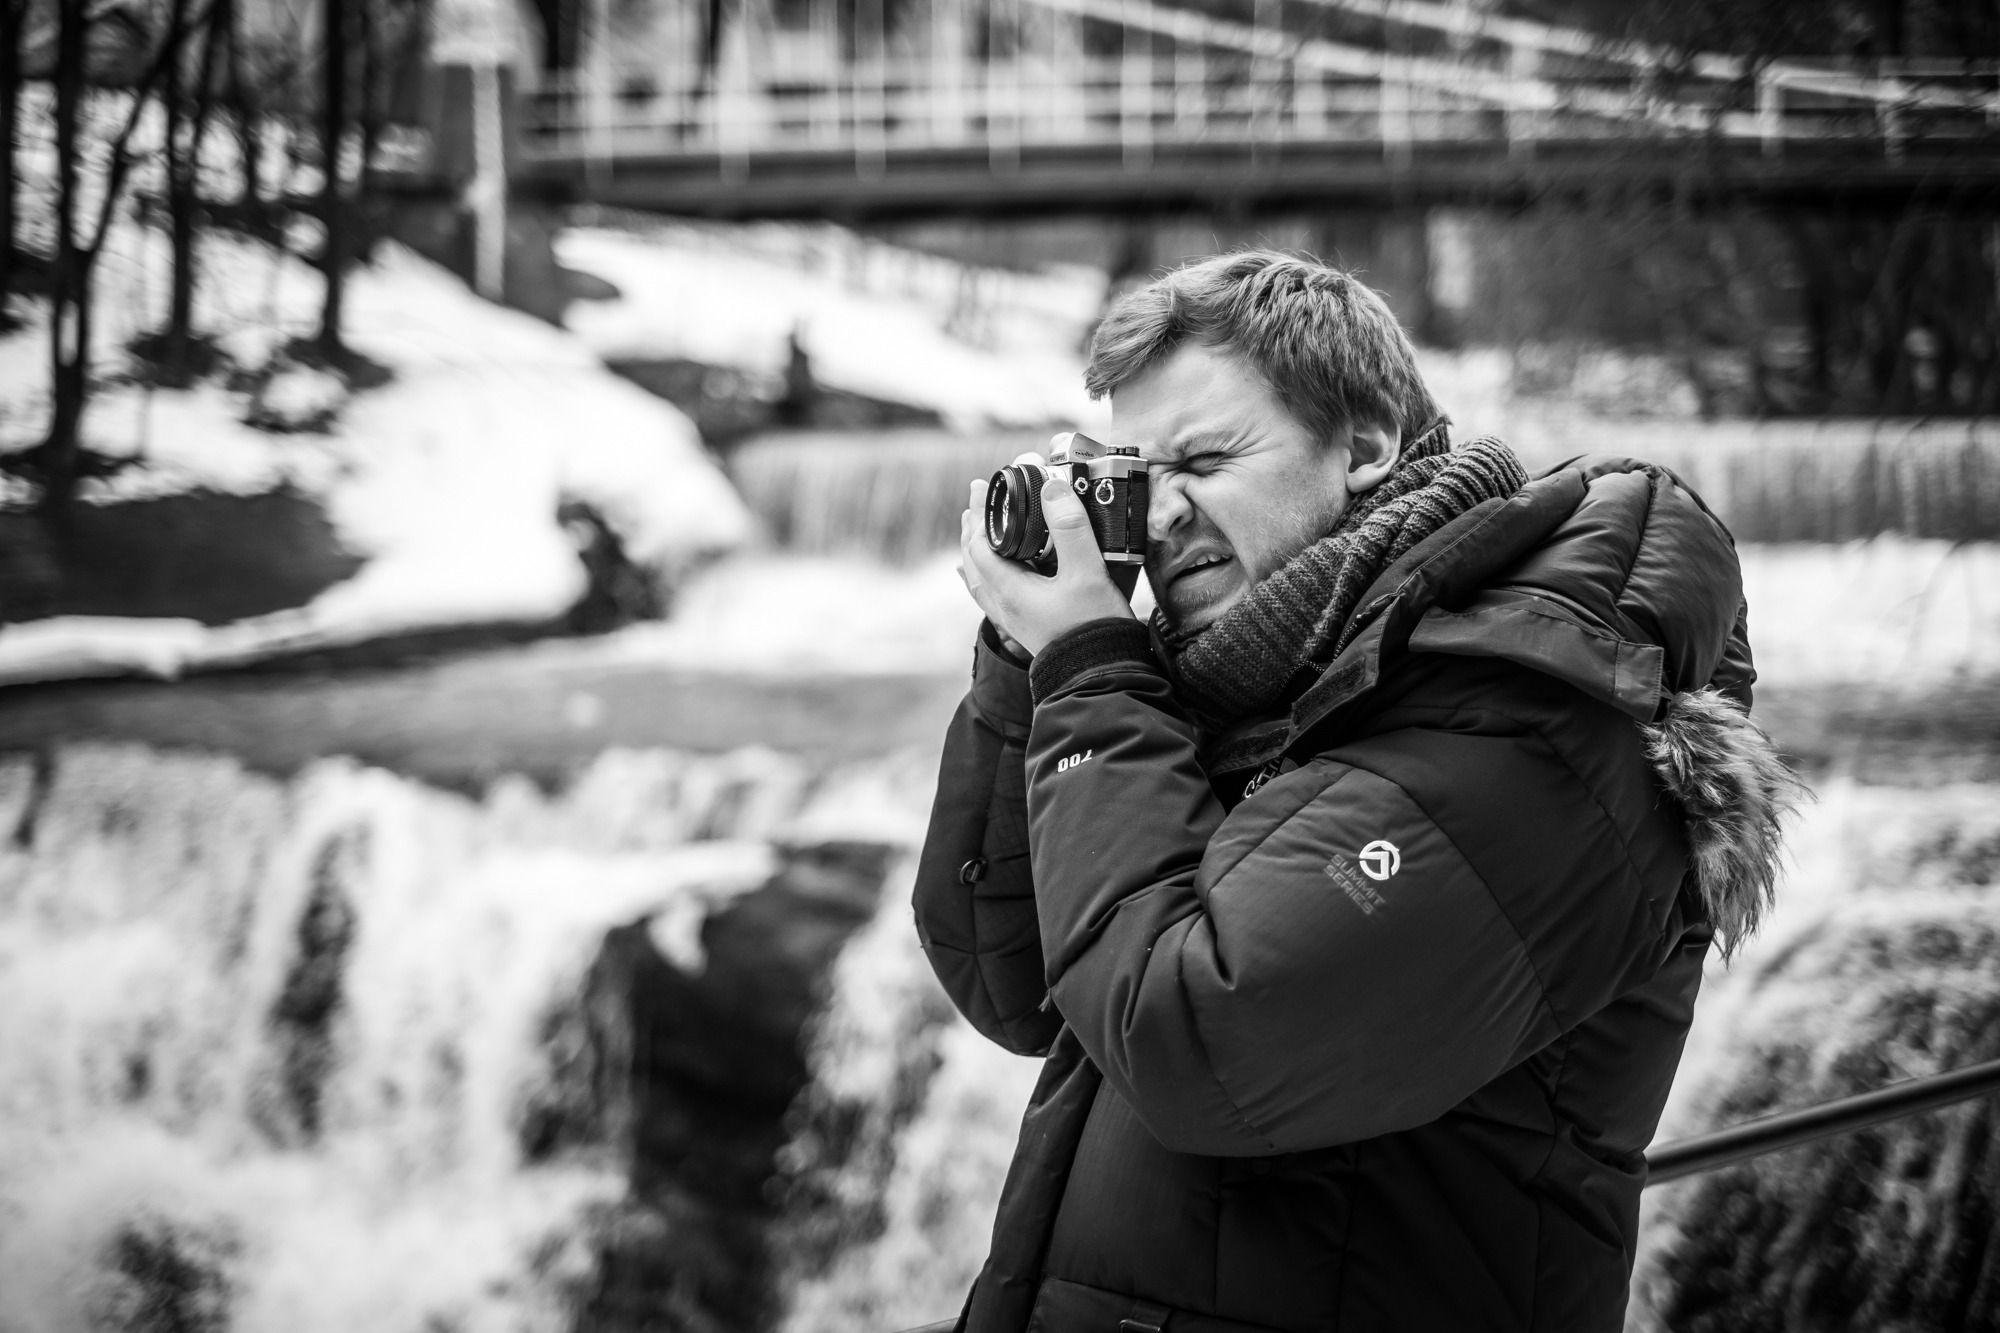 Fujifilm X-A1 - 35mm - 1/400 - f/1.4 - ISO 250.Foto: Johannes Granseth